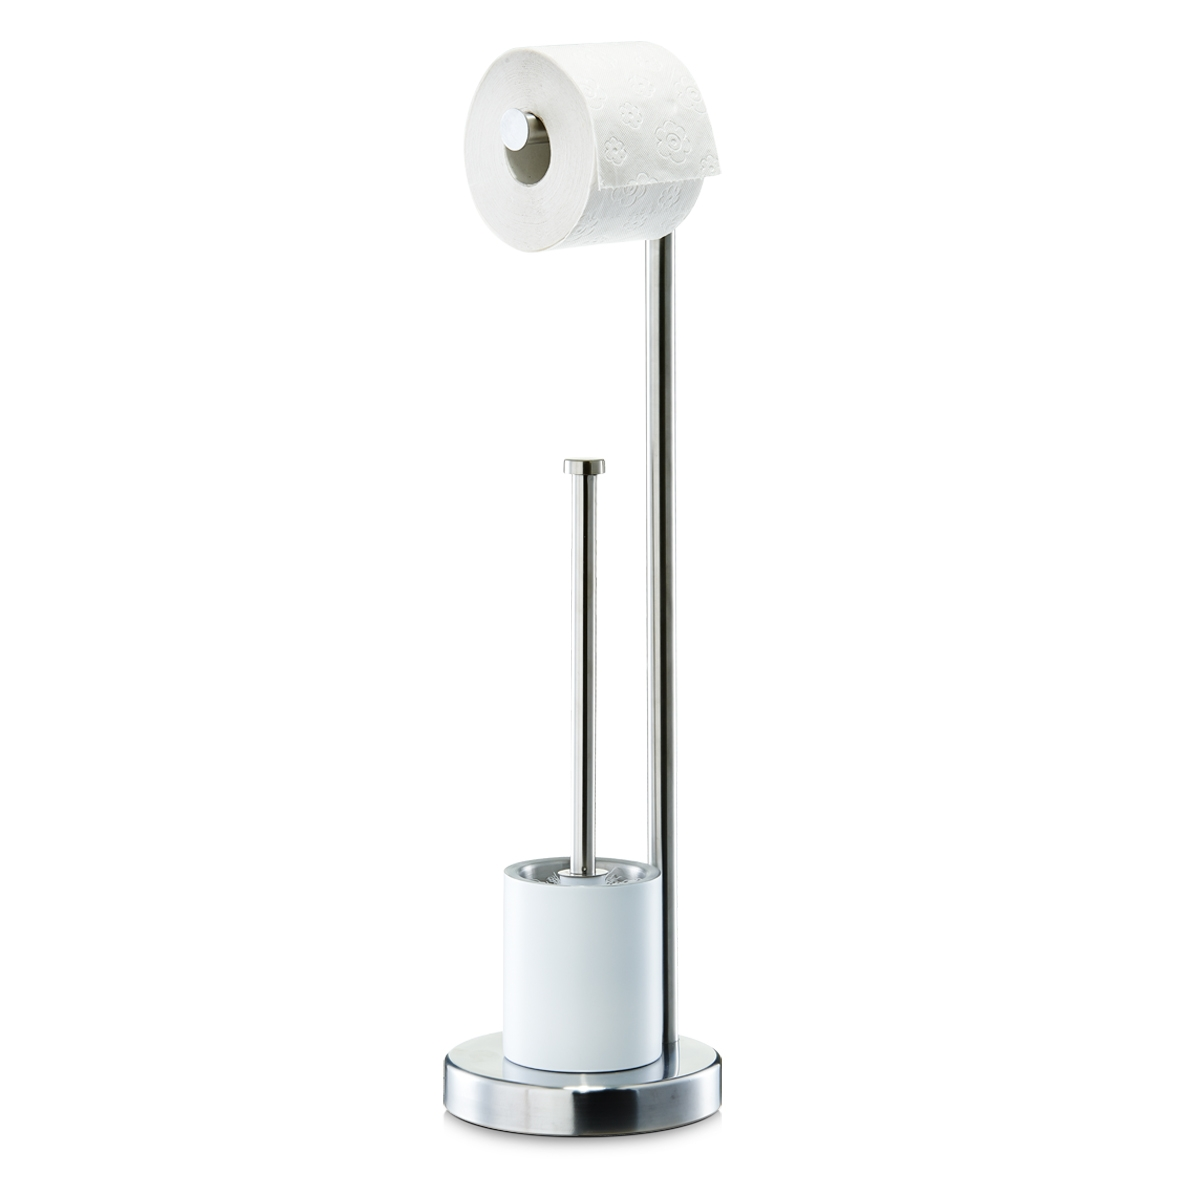 Suport pentru hartie igienica si perie de toaleta, Otel inoxidabil White, Ø 16,8xH60 cm poza